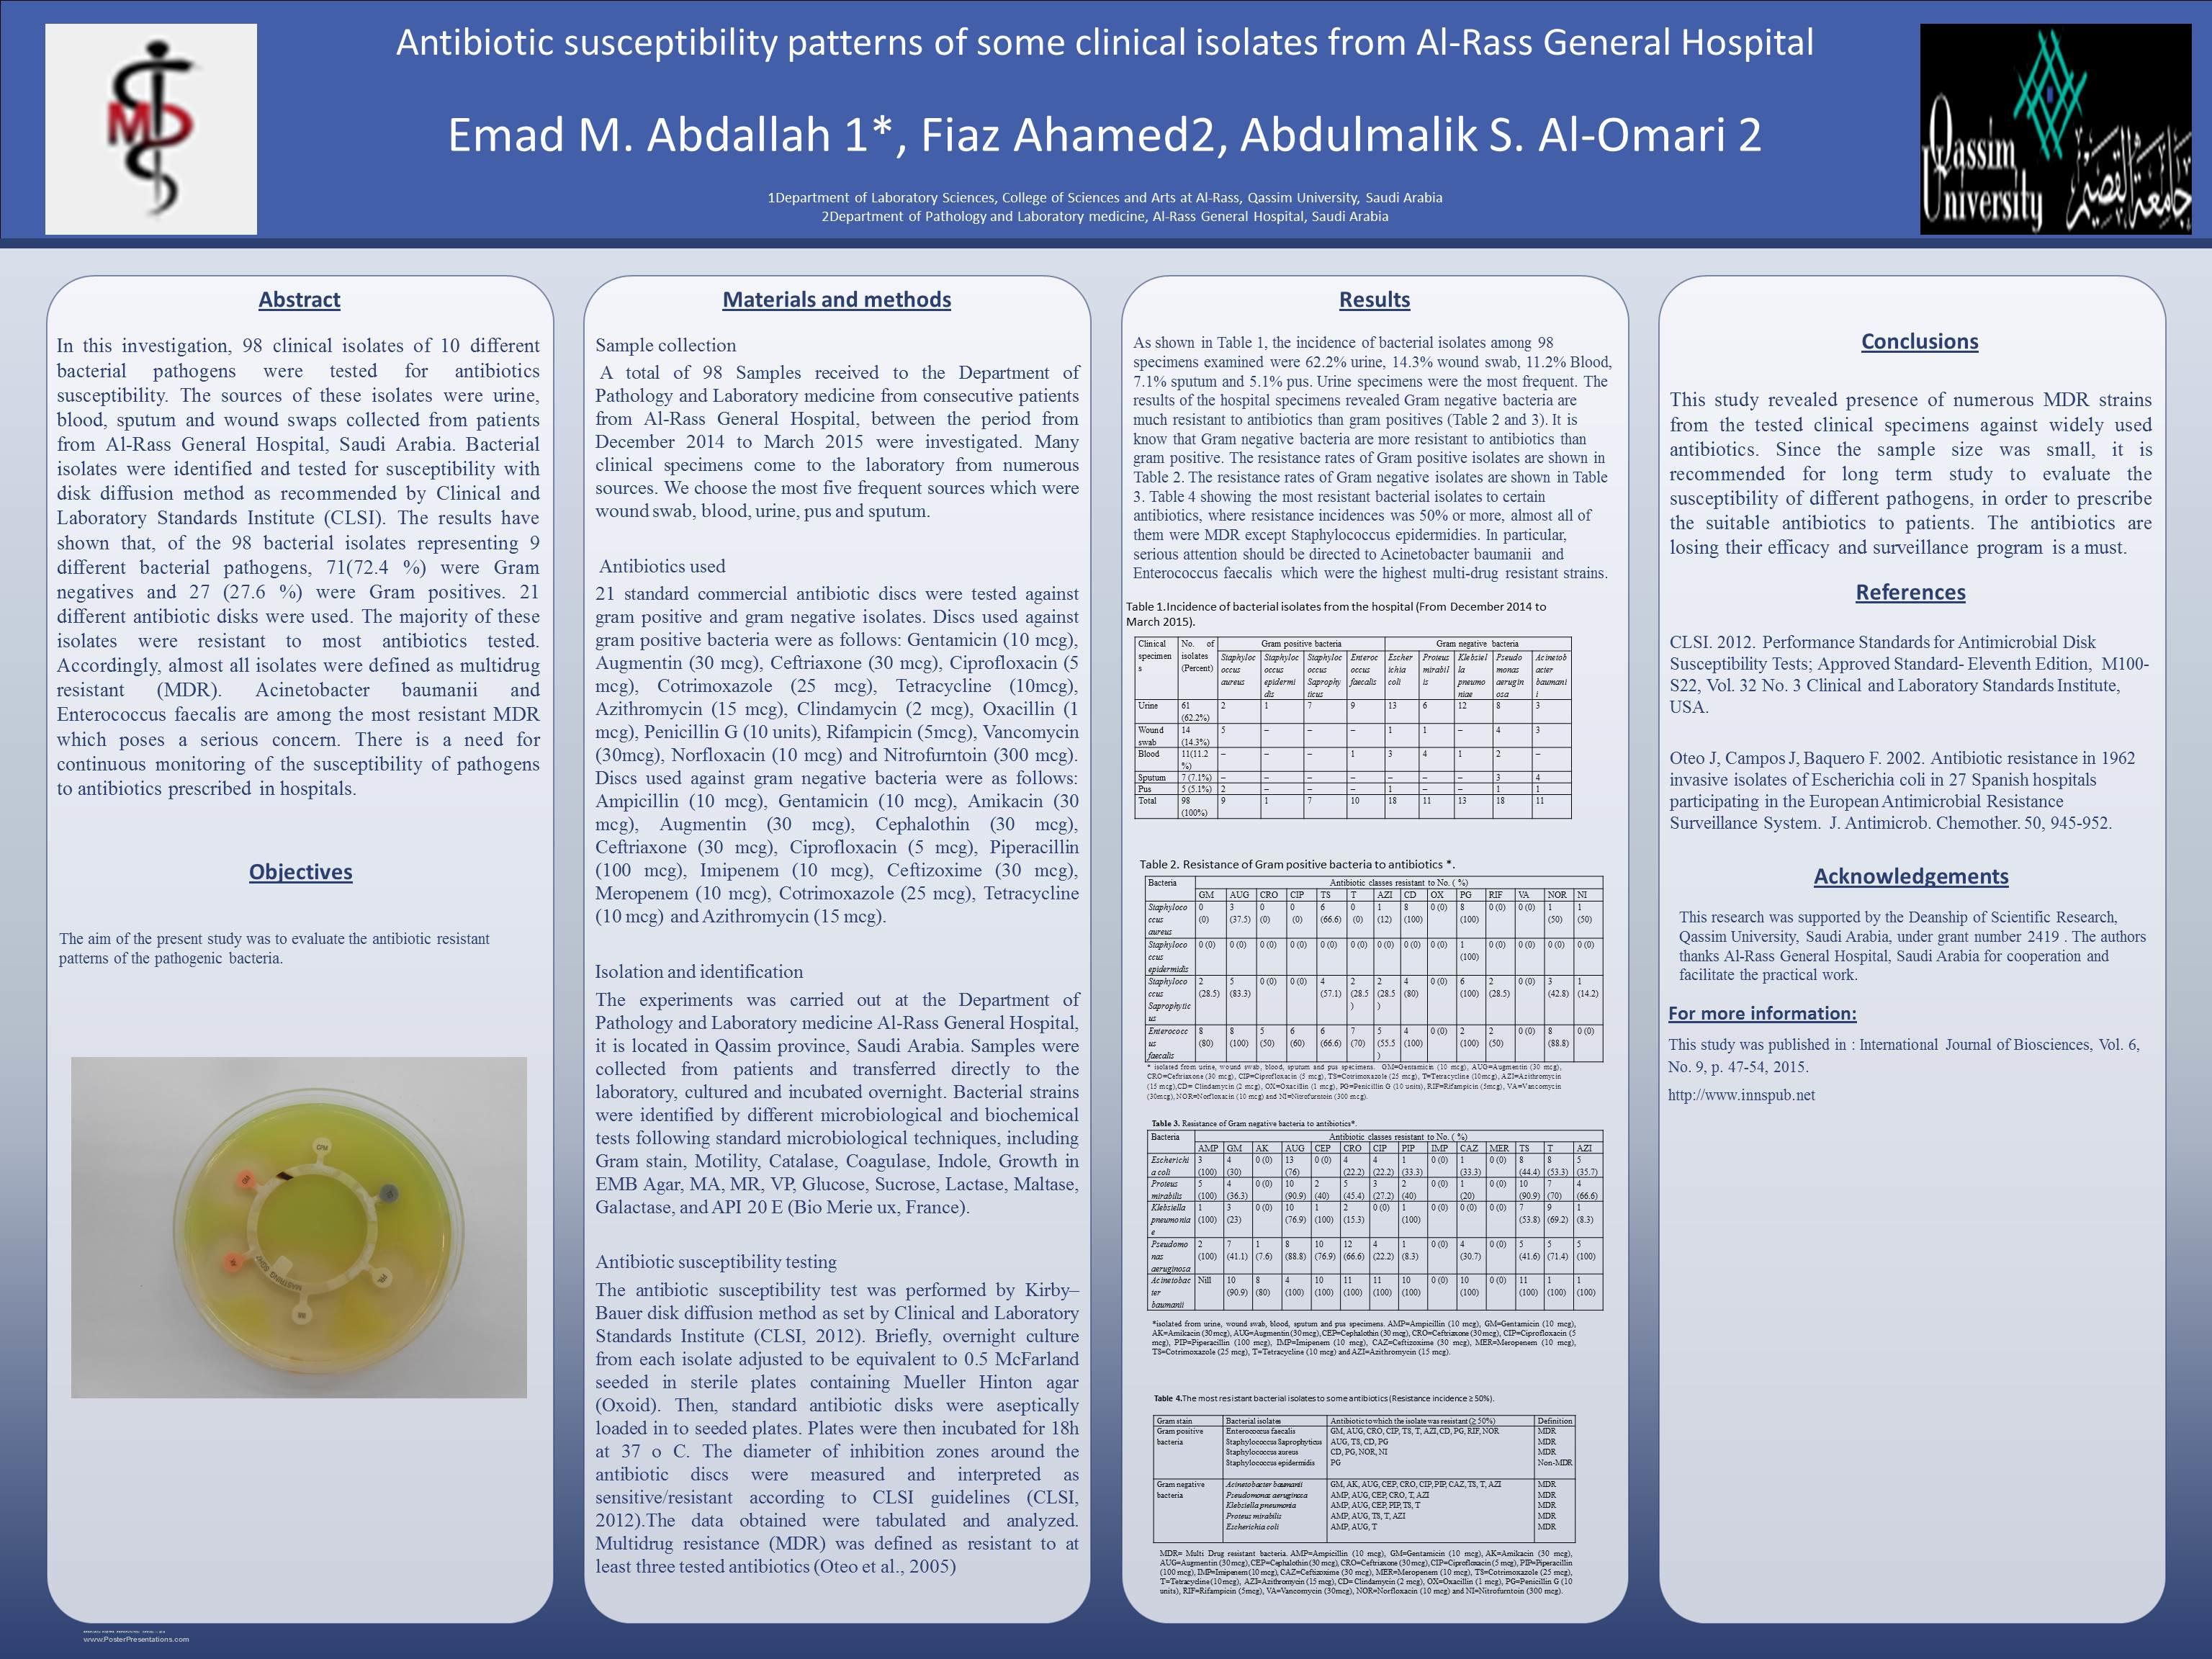 Converted abdallah et al ..